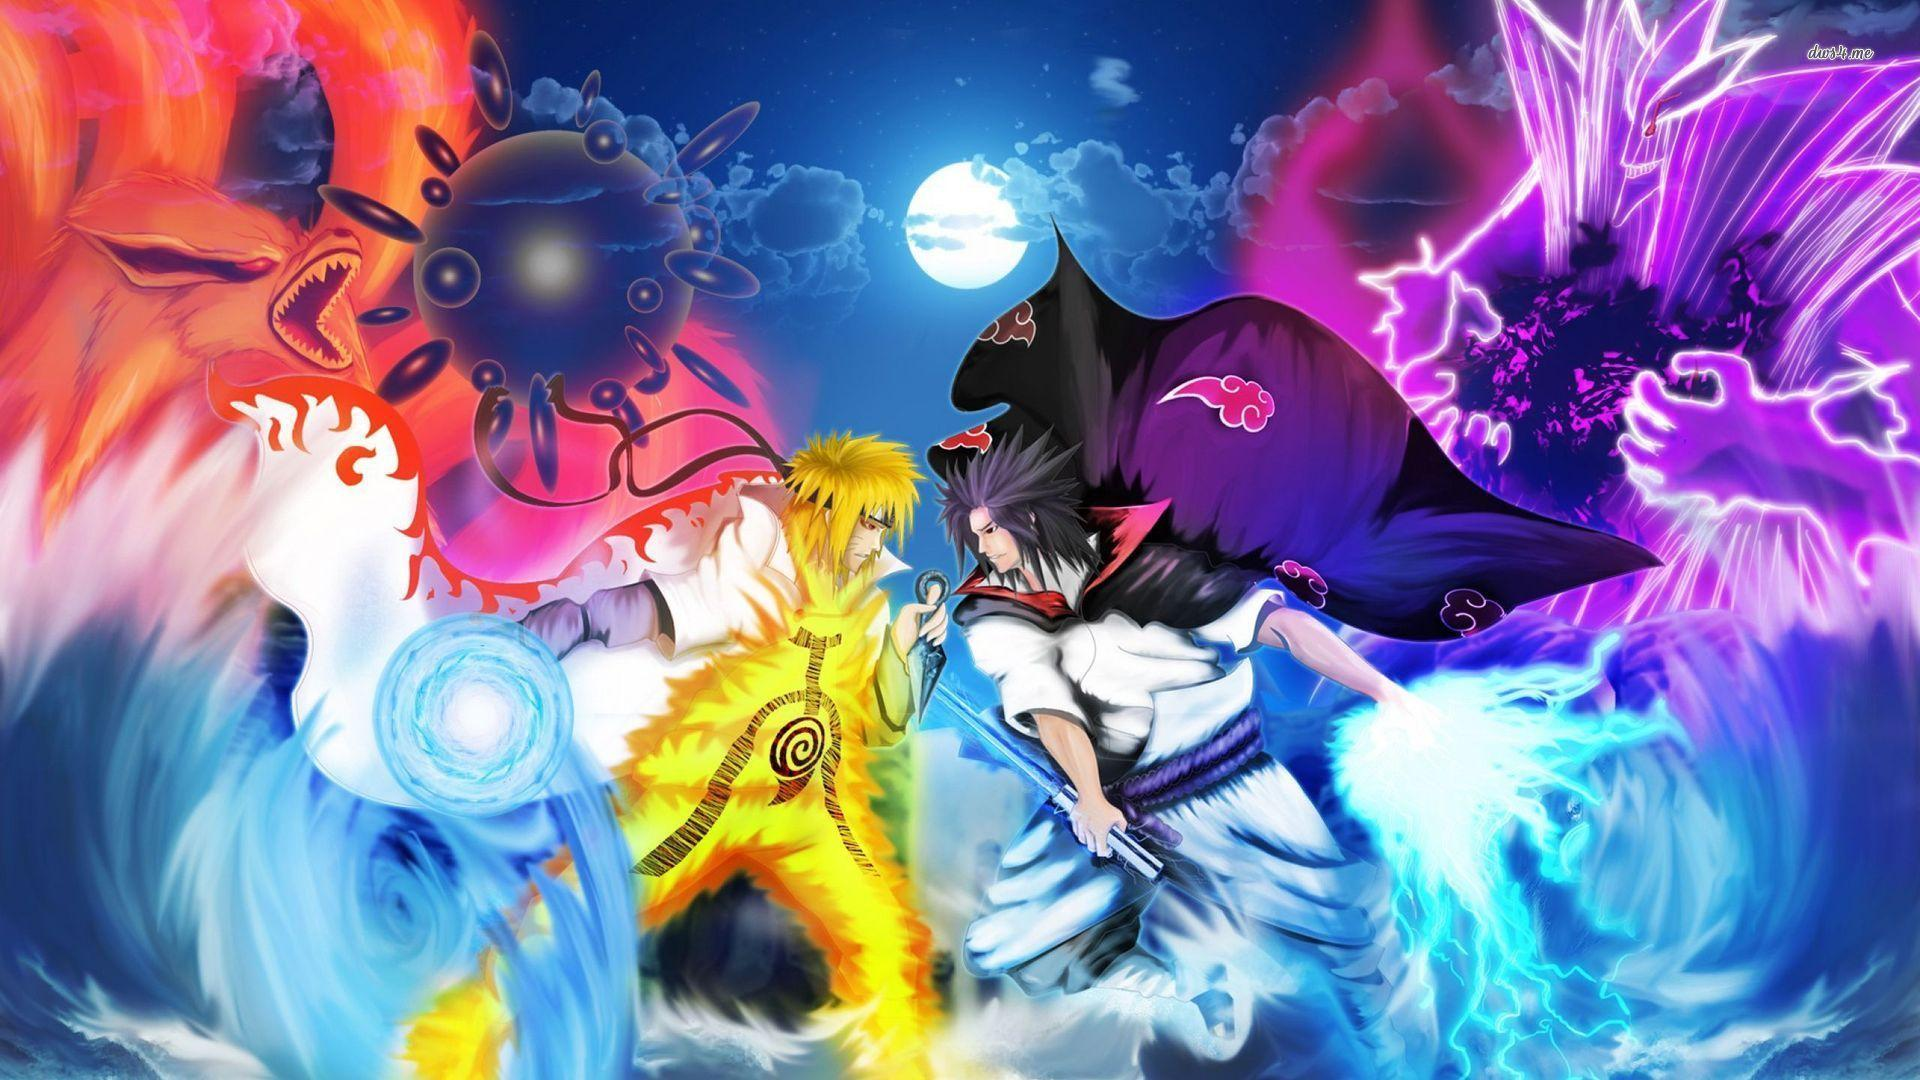 Naruto And Sasuke Hd Wallpapers Wallpaper Cave